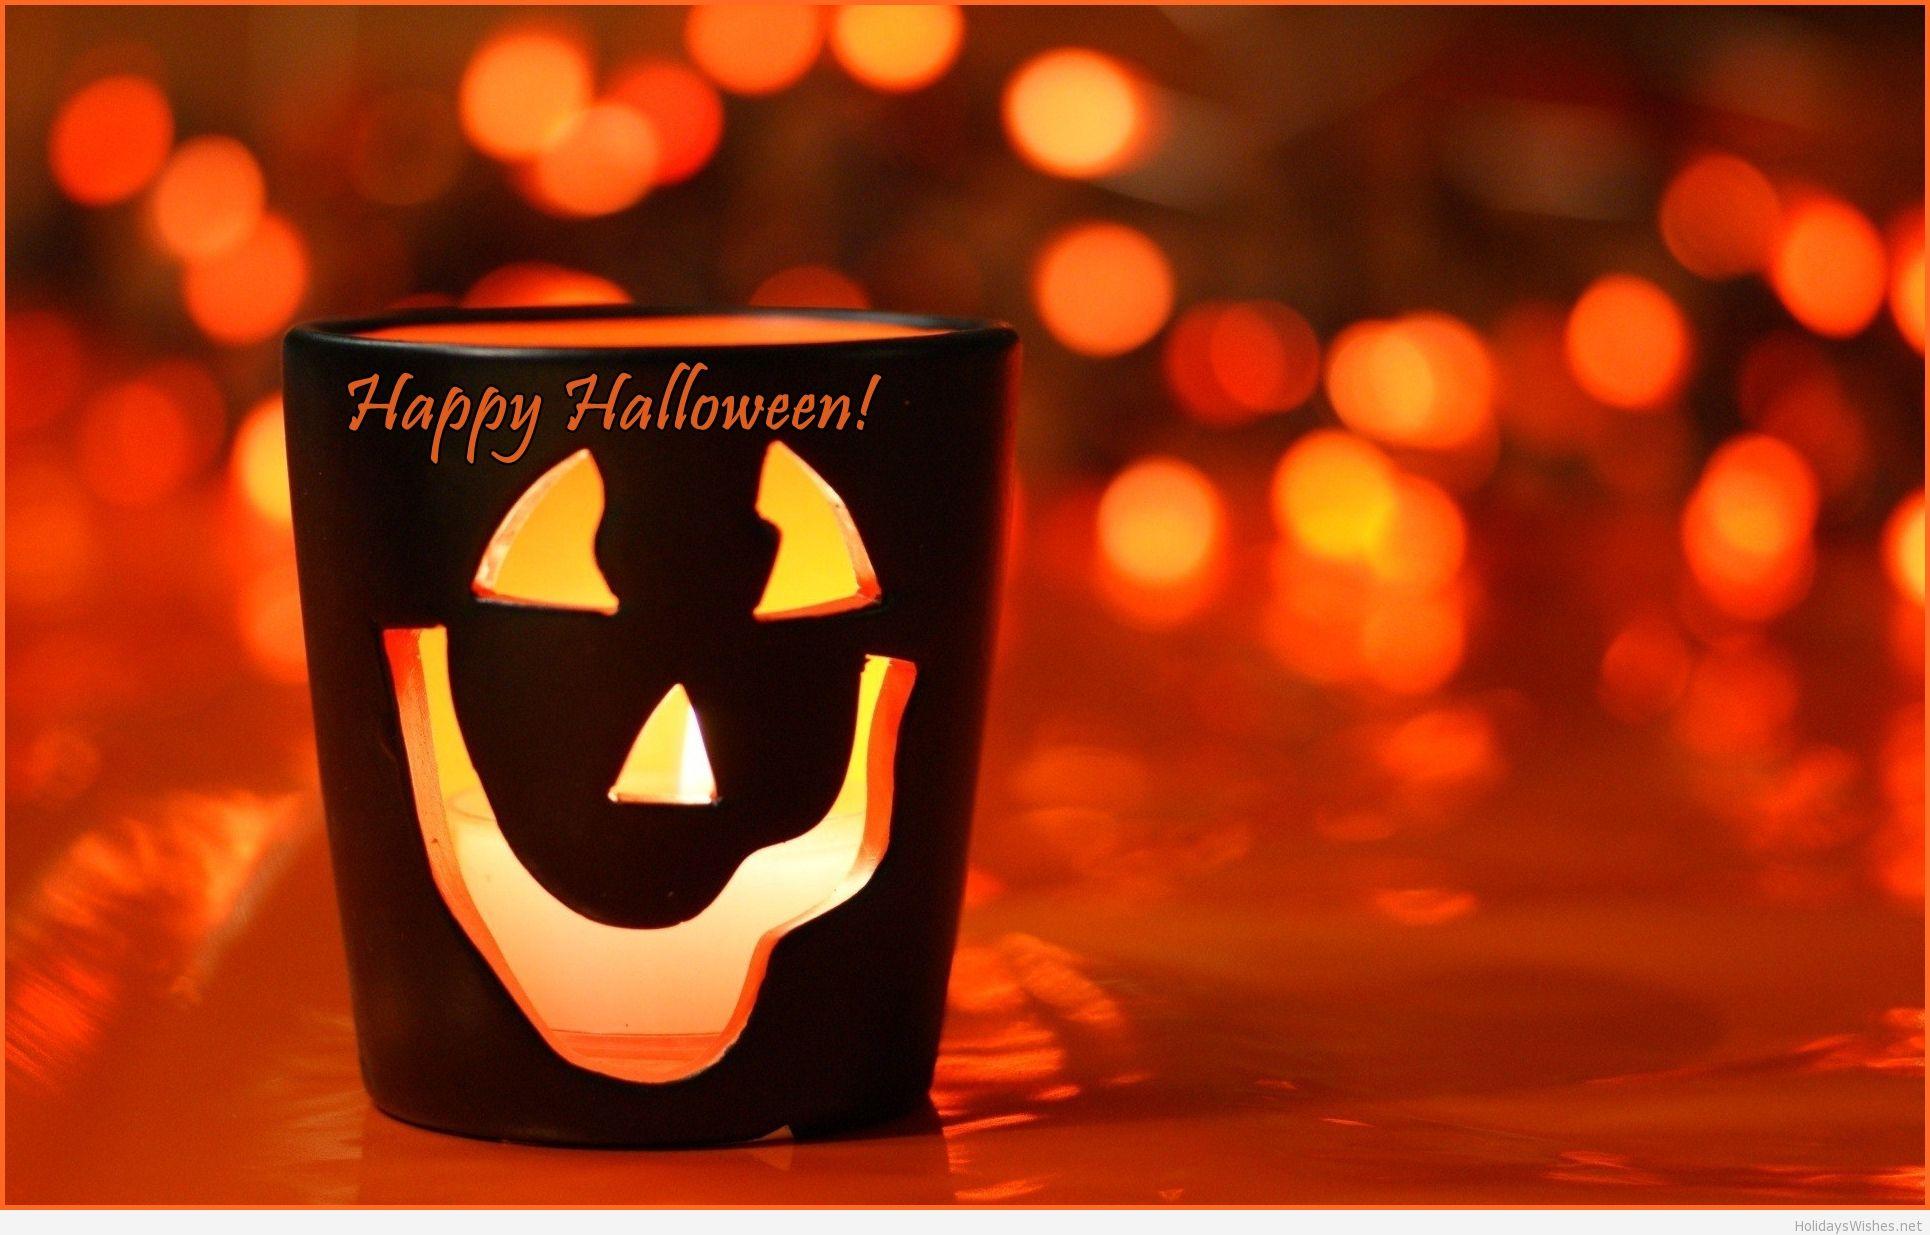 Happy-Halloween-Mug-picture